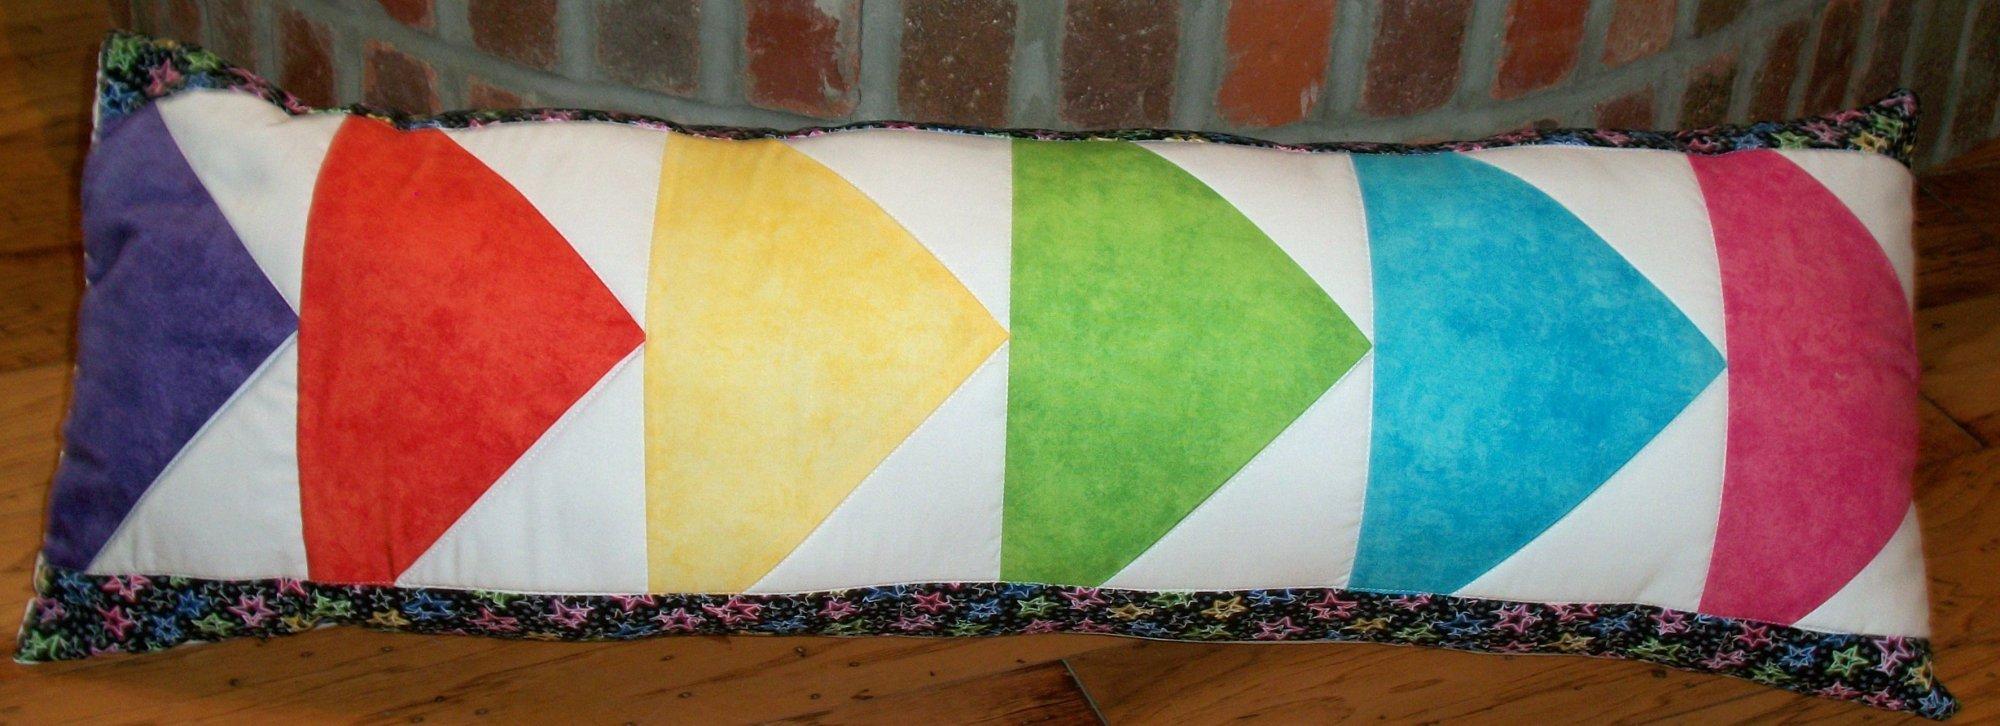 Arrows Bench Pillow - Finishing Kit